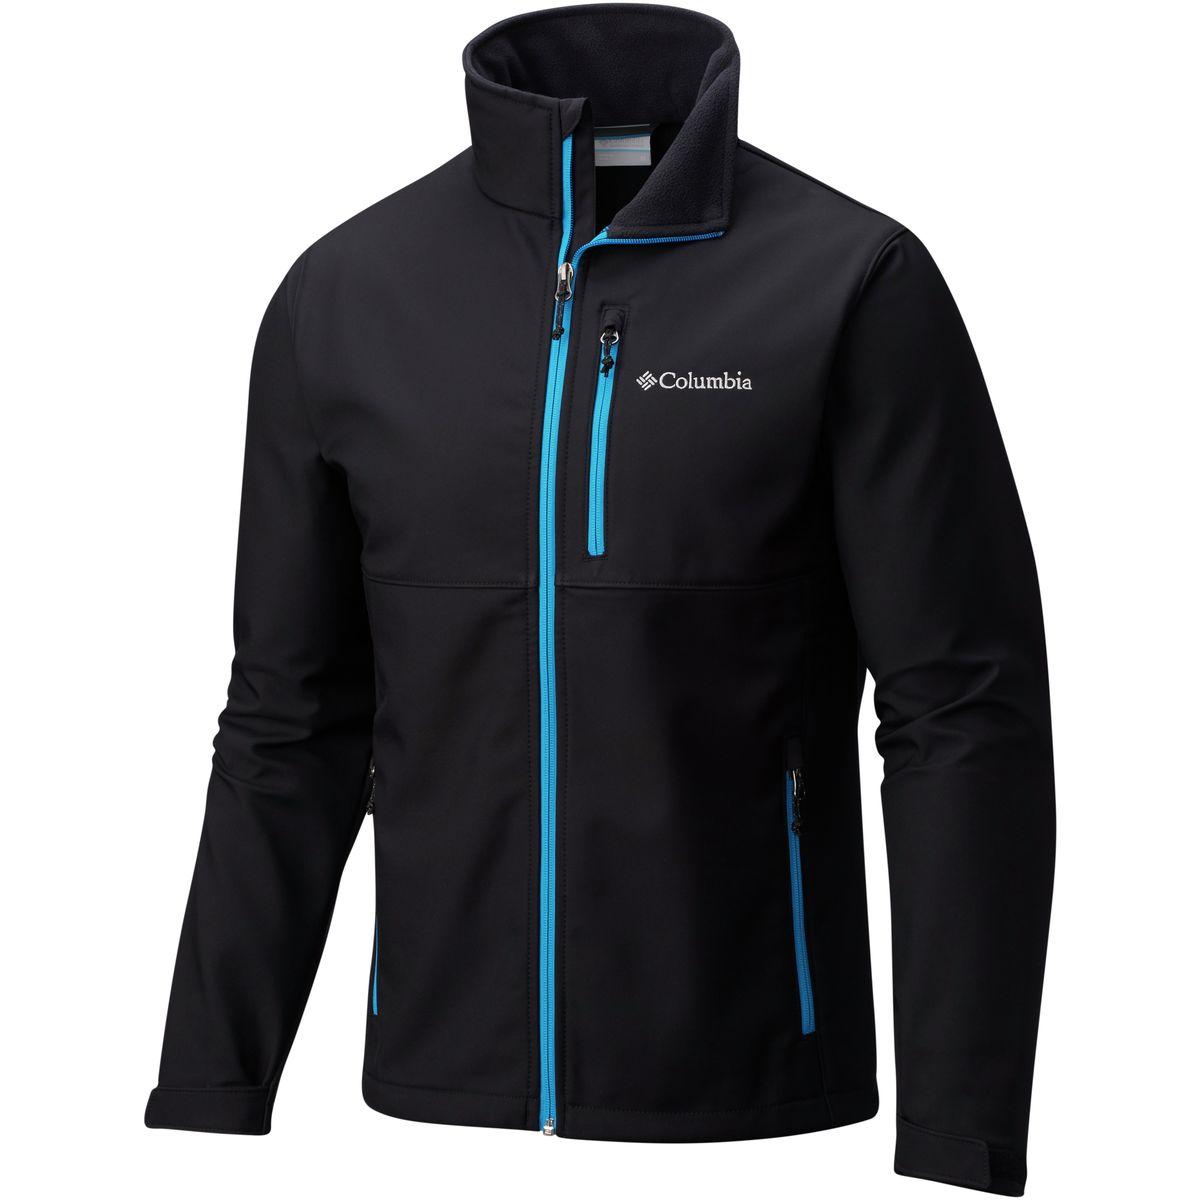 Columbia Ascender Softshell Jacket - Black/Dark Compass